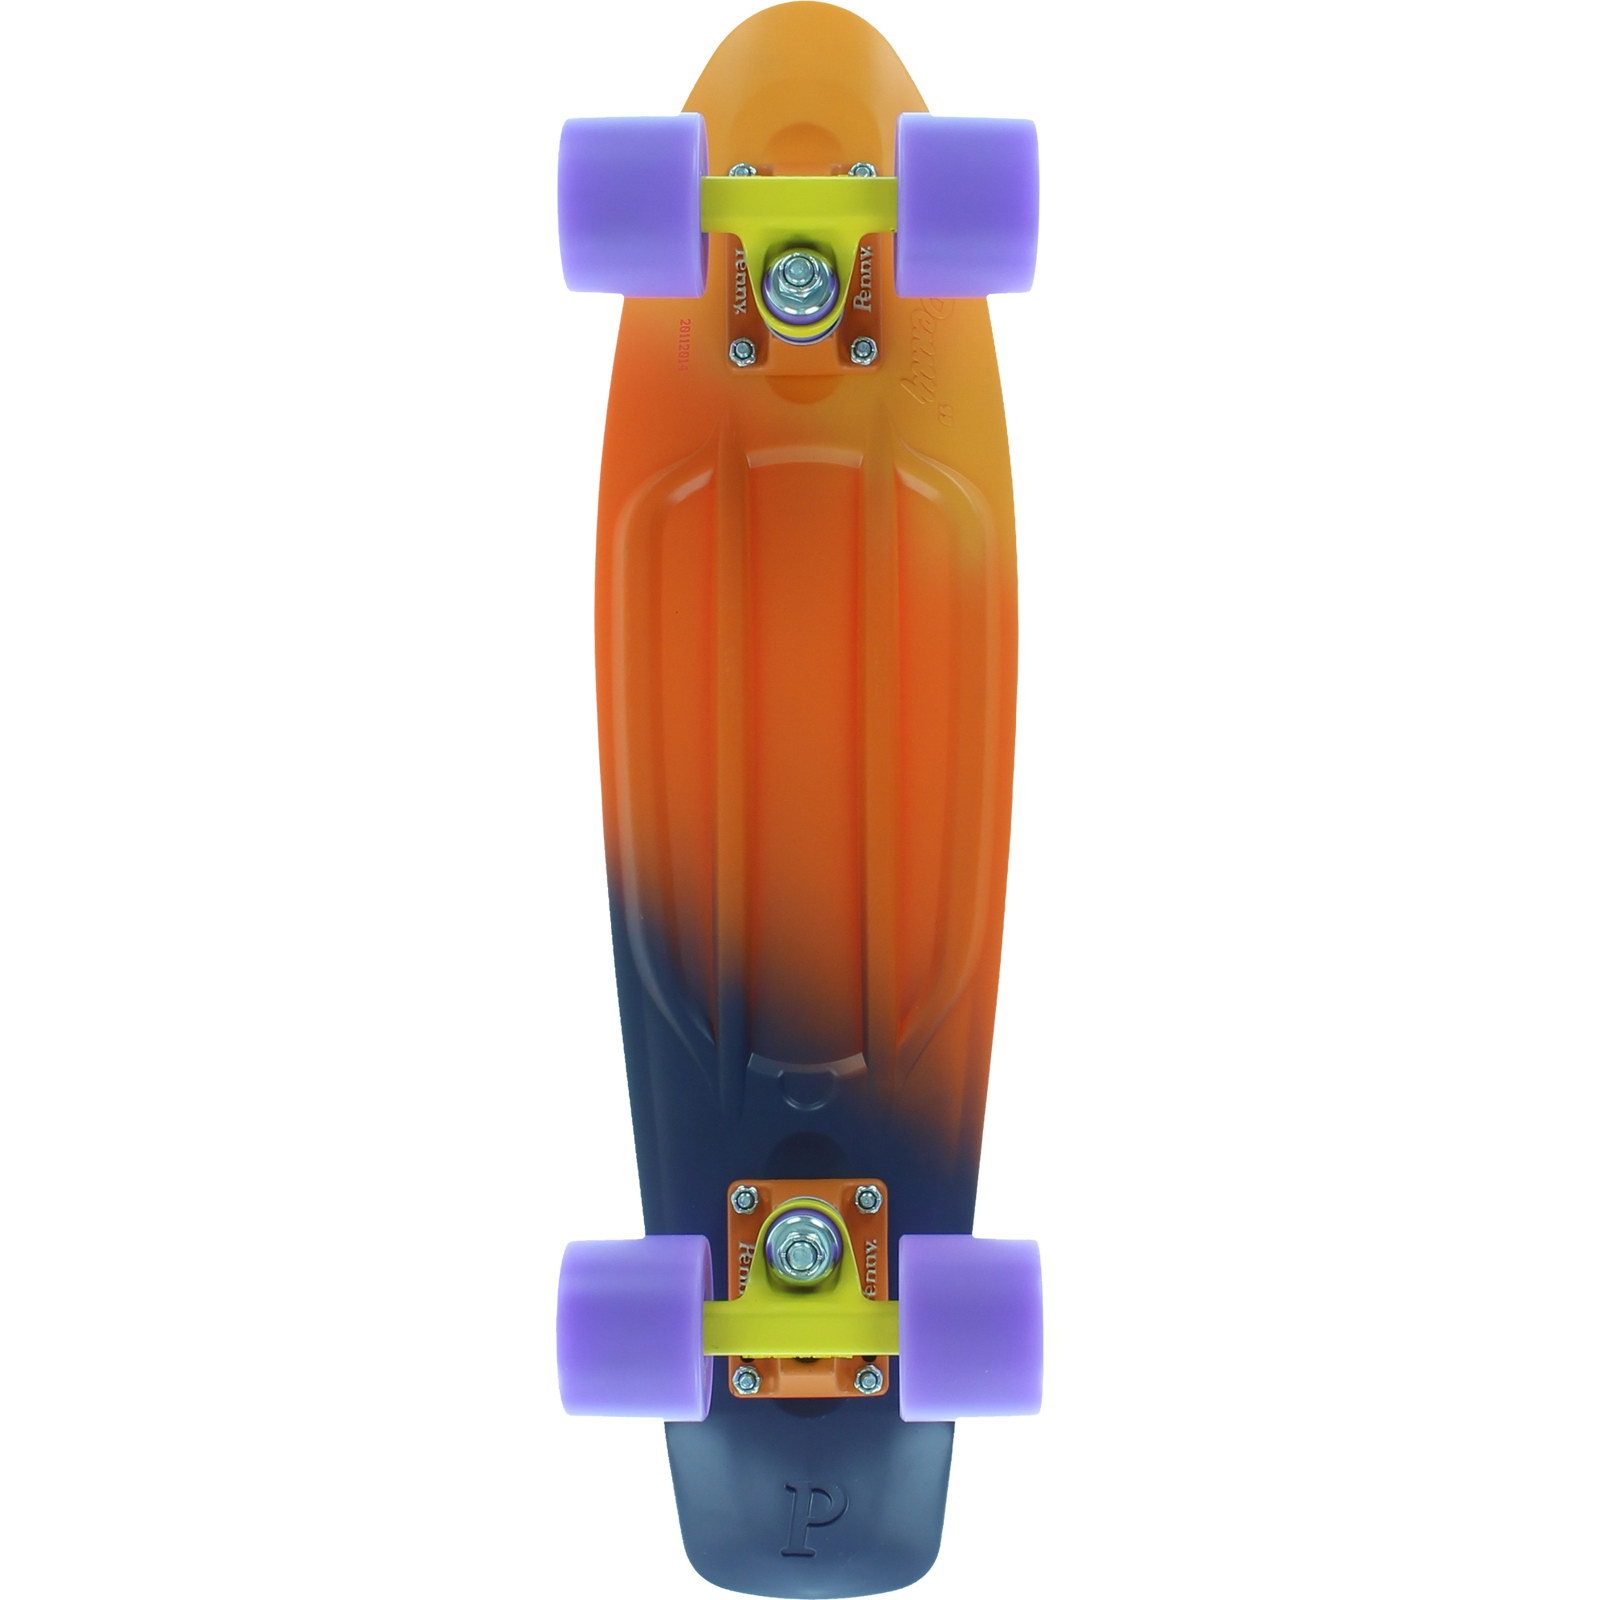 "PENNY Skateboards Dusk Fade 22"" Complete Cruiser Skateboa..."